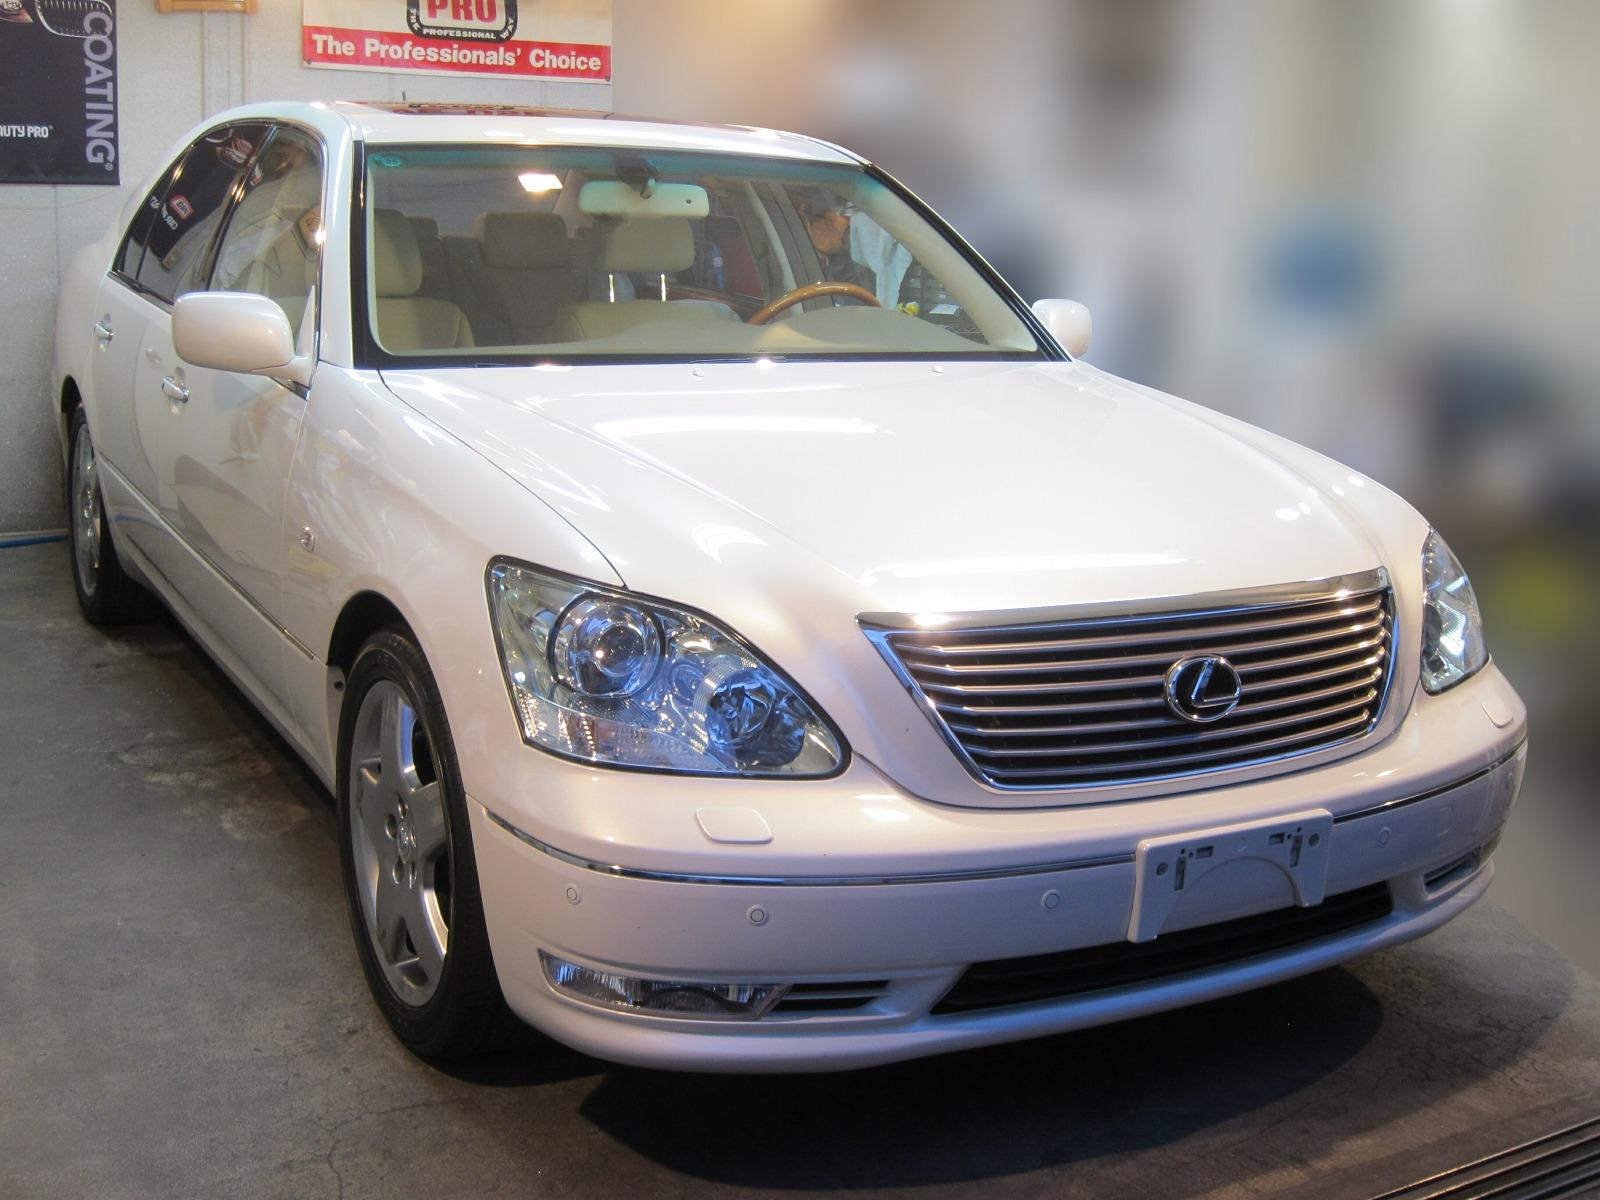 20131227-lexus-ls430-01